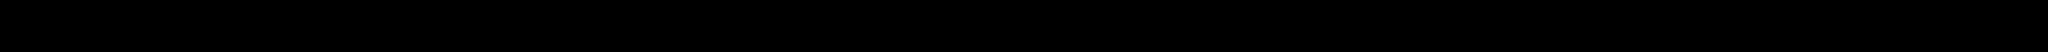 BREMBO 23871, 23872, 24088, 24453, 7784D905 Sada brzdových destiček, kotoučová brzda